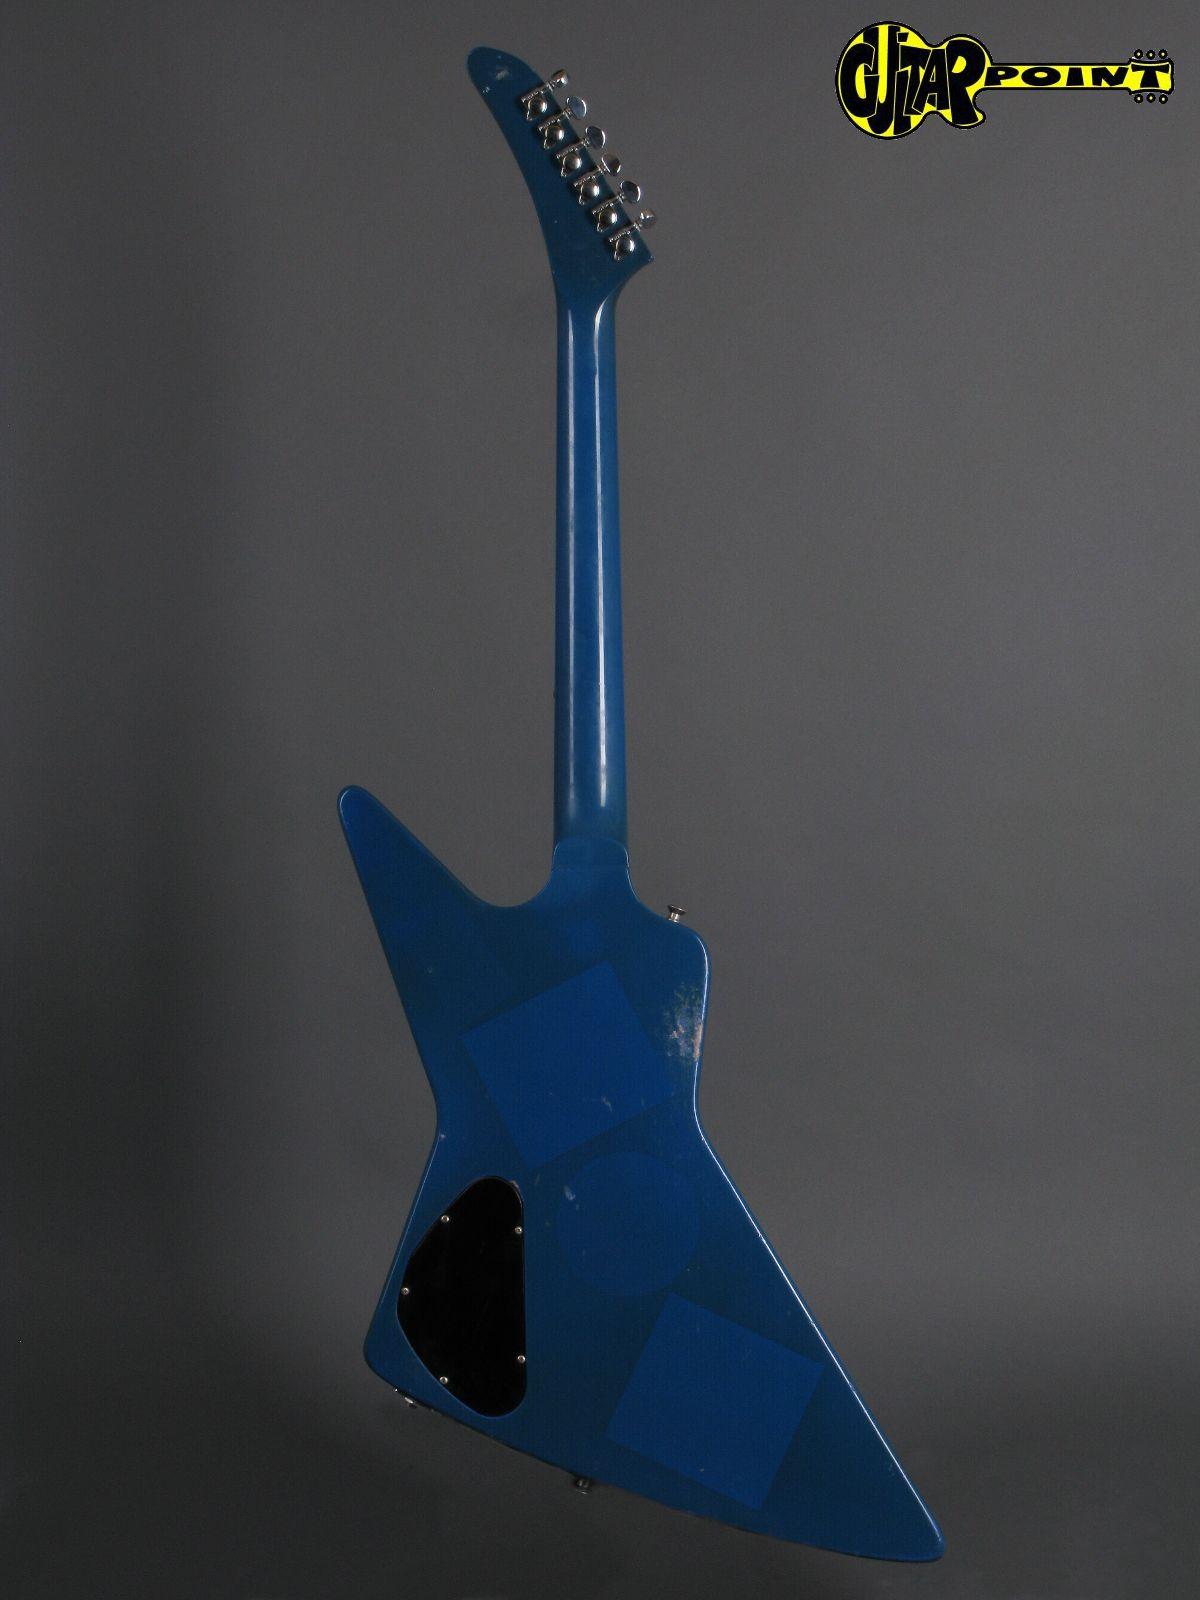 Gibson Explorer 1984 Union Jack Custom Graphic Guitar